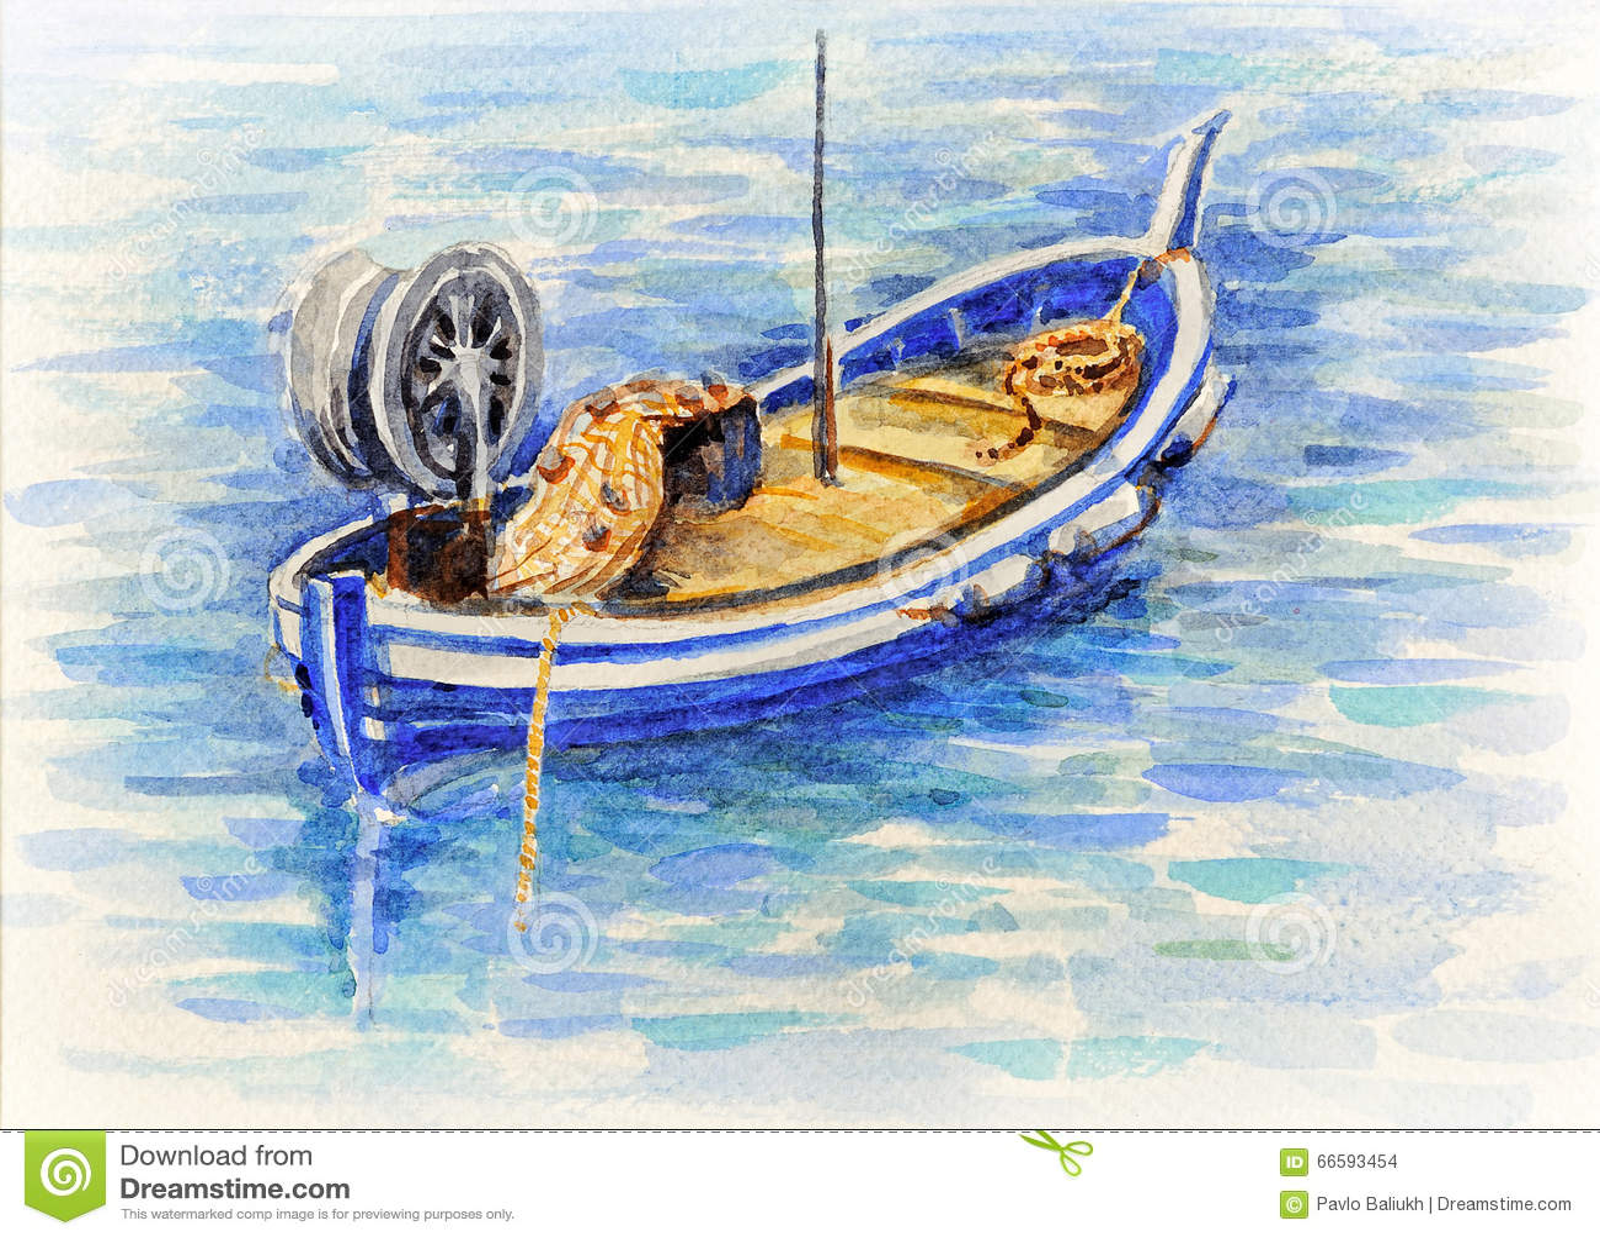 bateau de p che de photo d 39 aquarelle en mer m diterran e illustration stock image 66593454. Black Bedroom Furniture Sets. Home Design Ideas